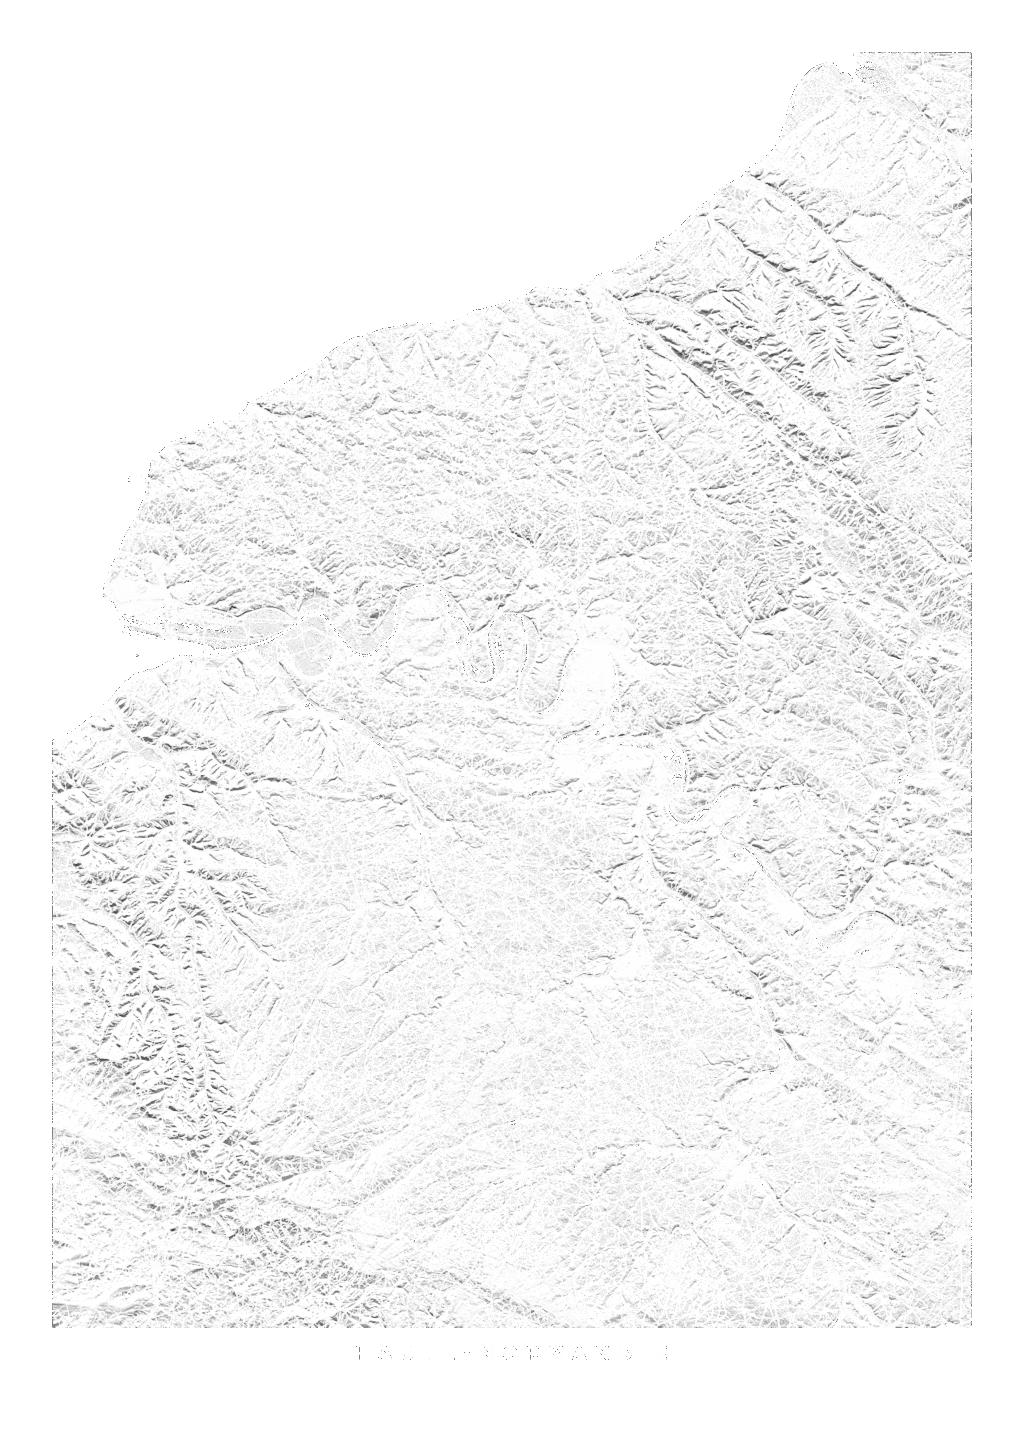 Haute Normandie wall map